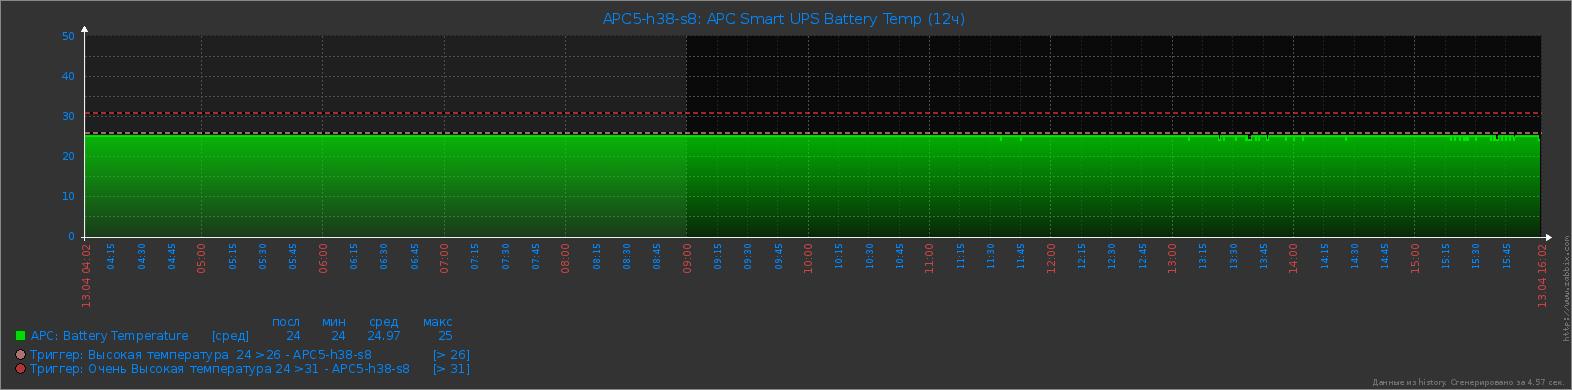 APC Smart UPS - Battery Temp